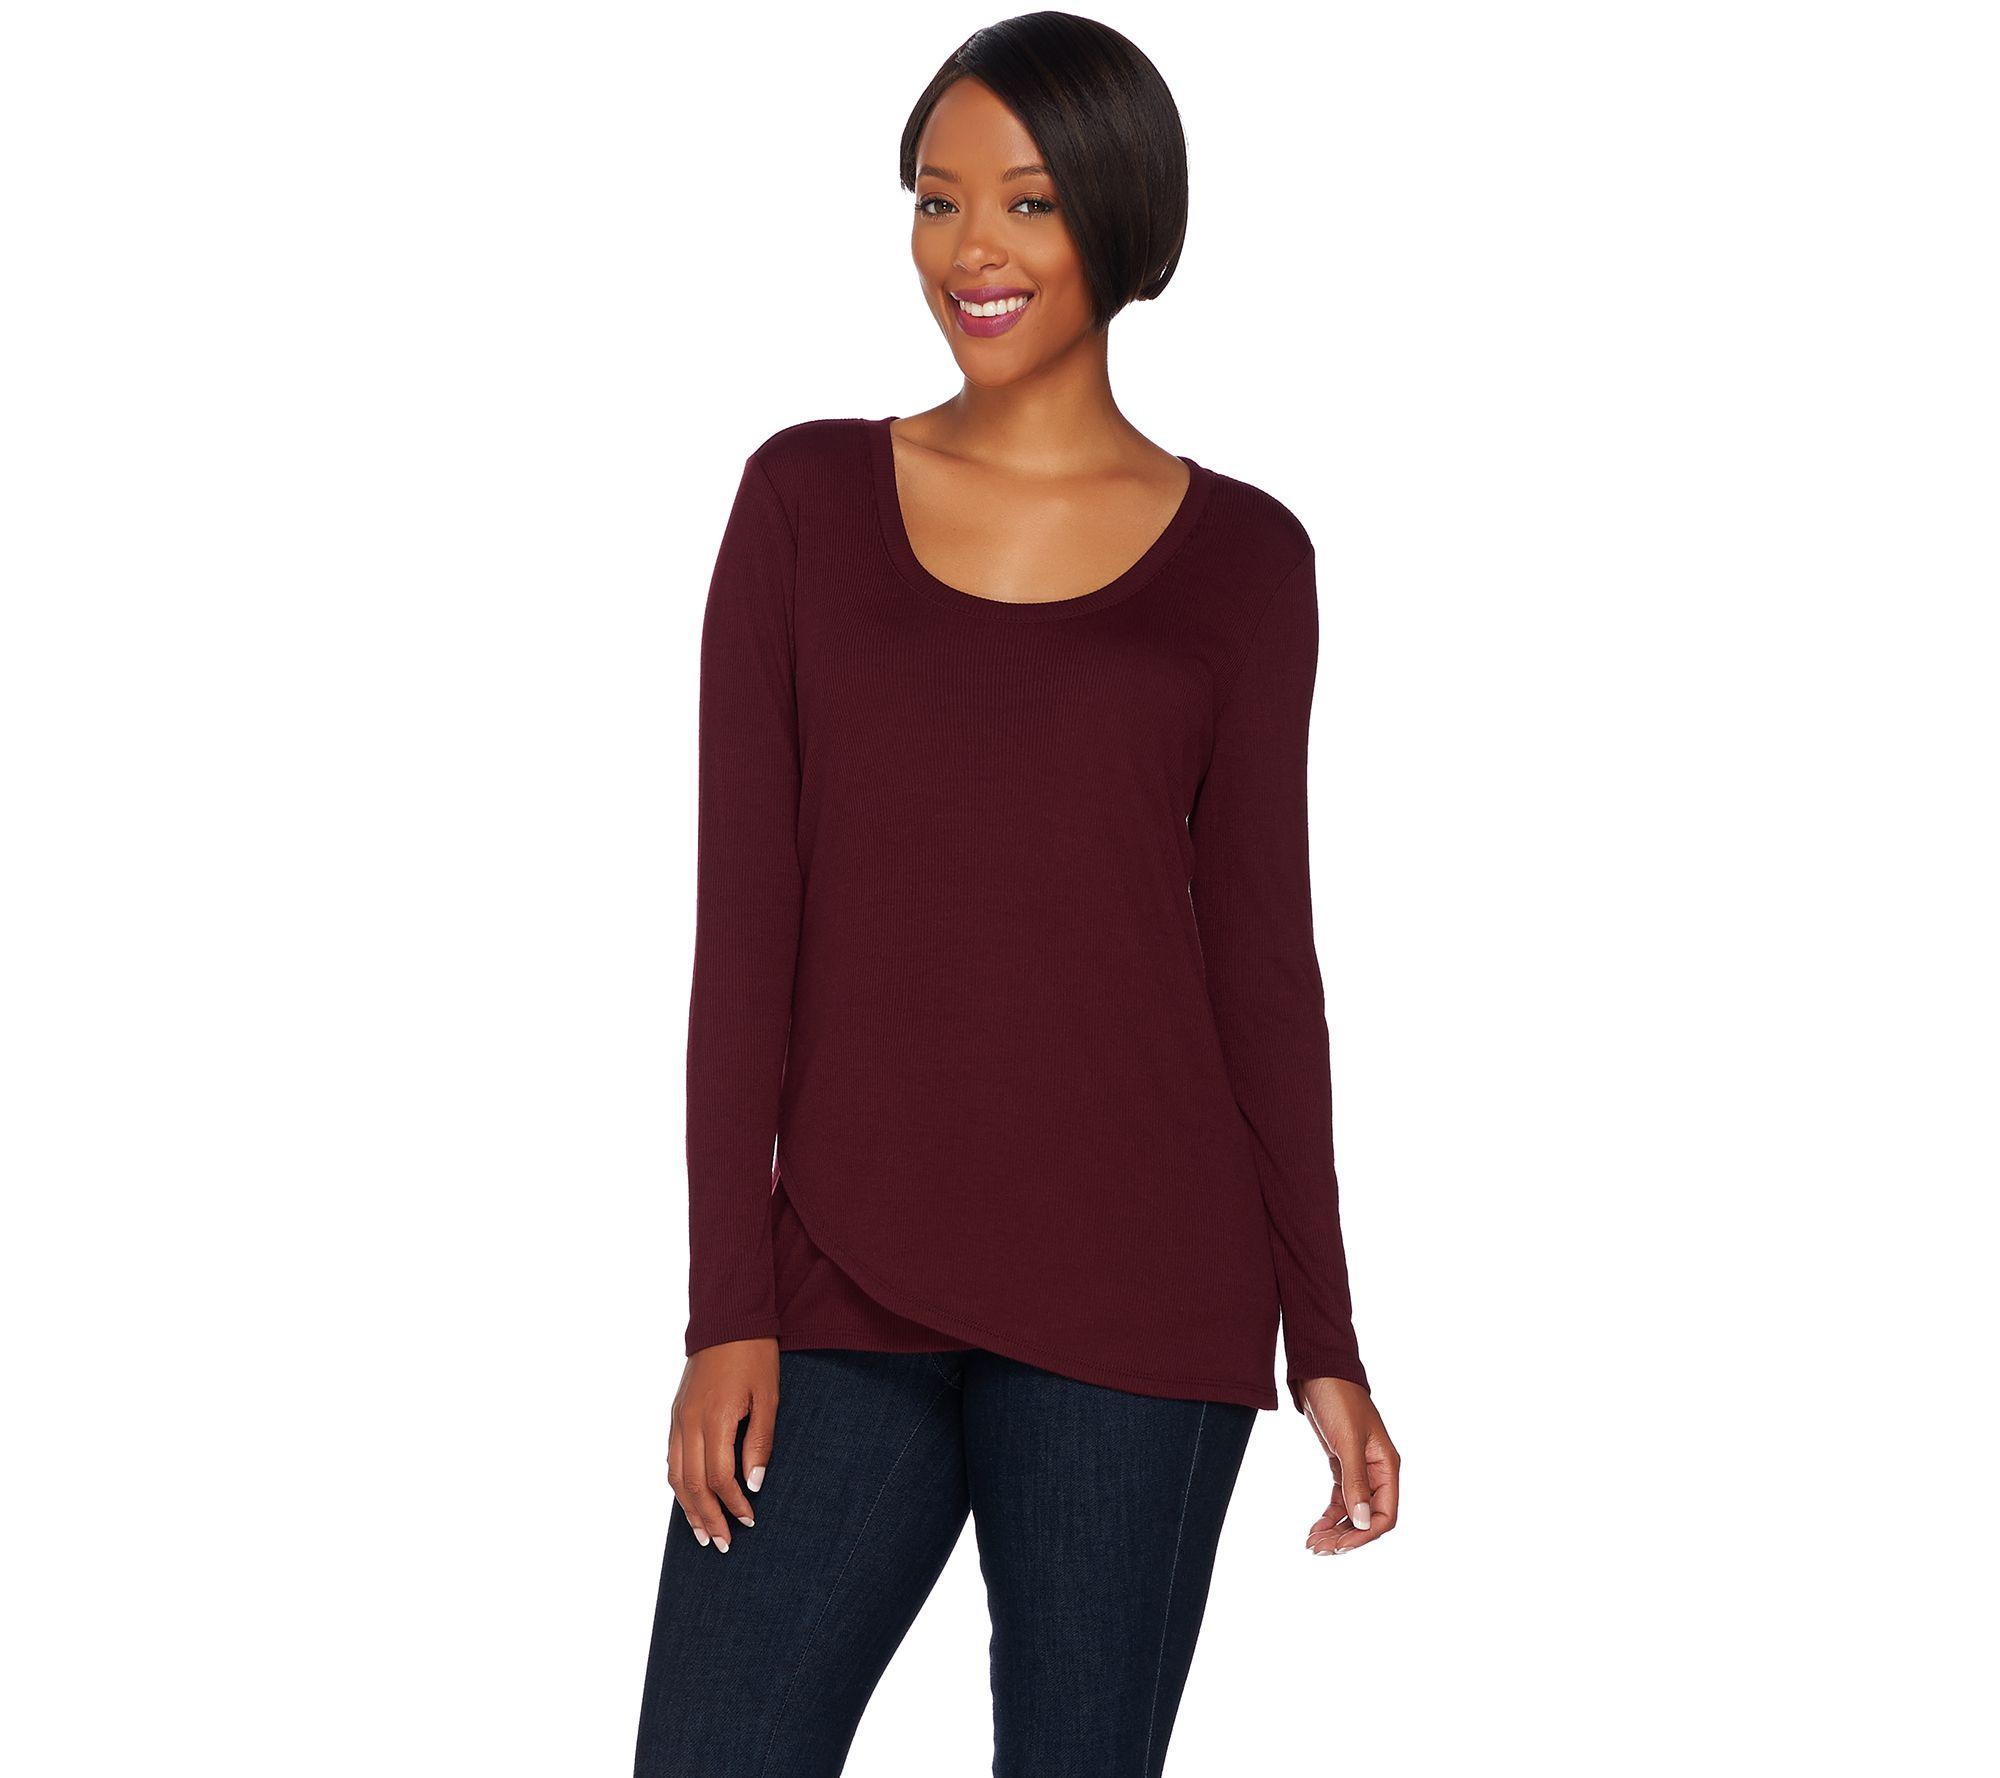 Qvc Blouses Ladies - Long Sleeved Blouse